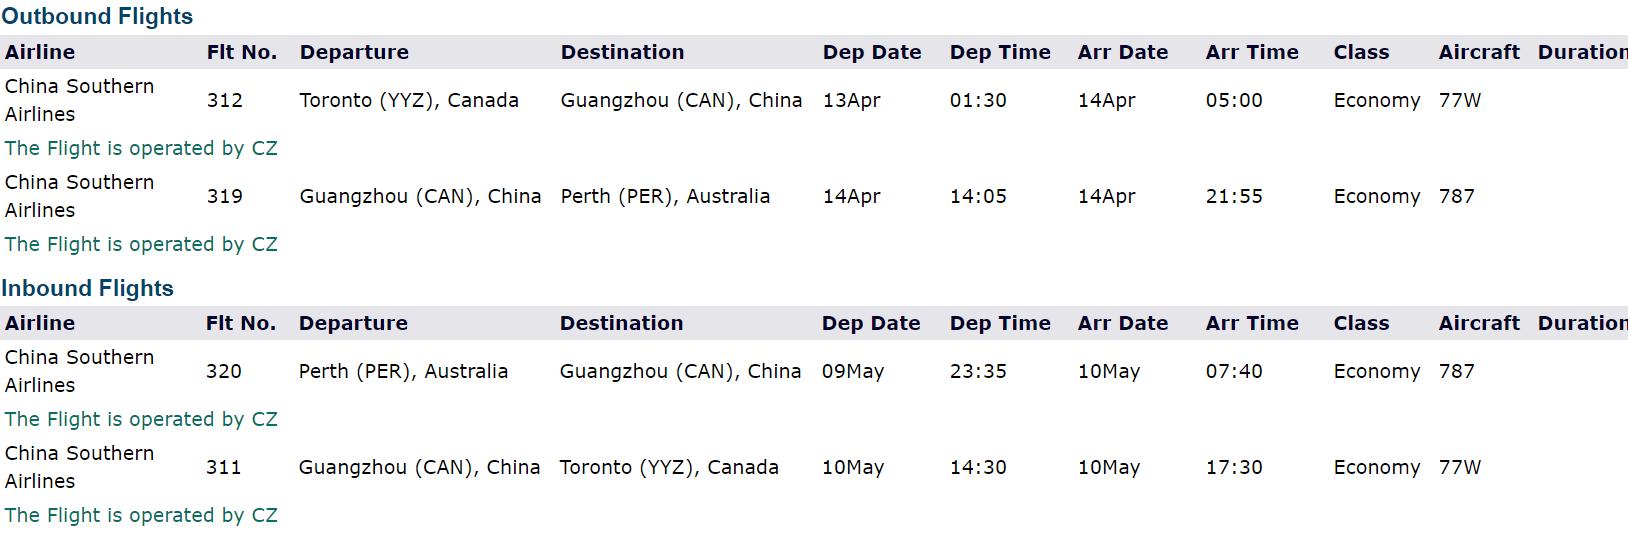 Expiration dates in Perth